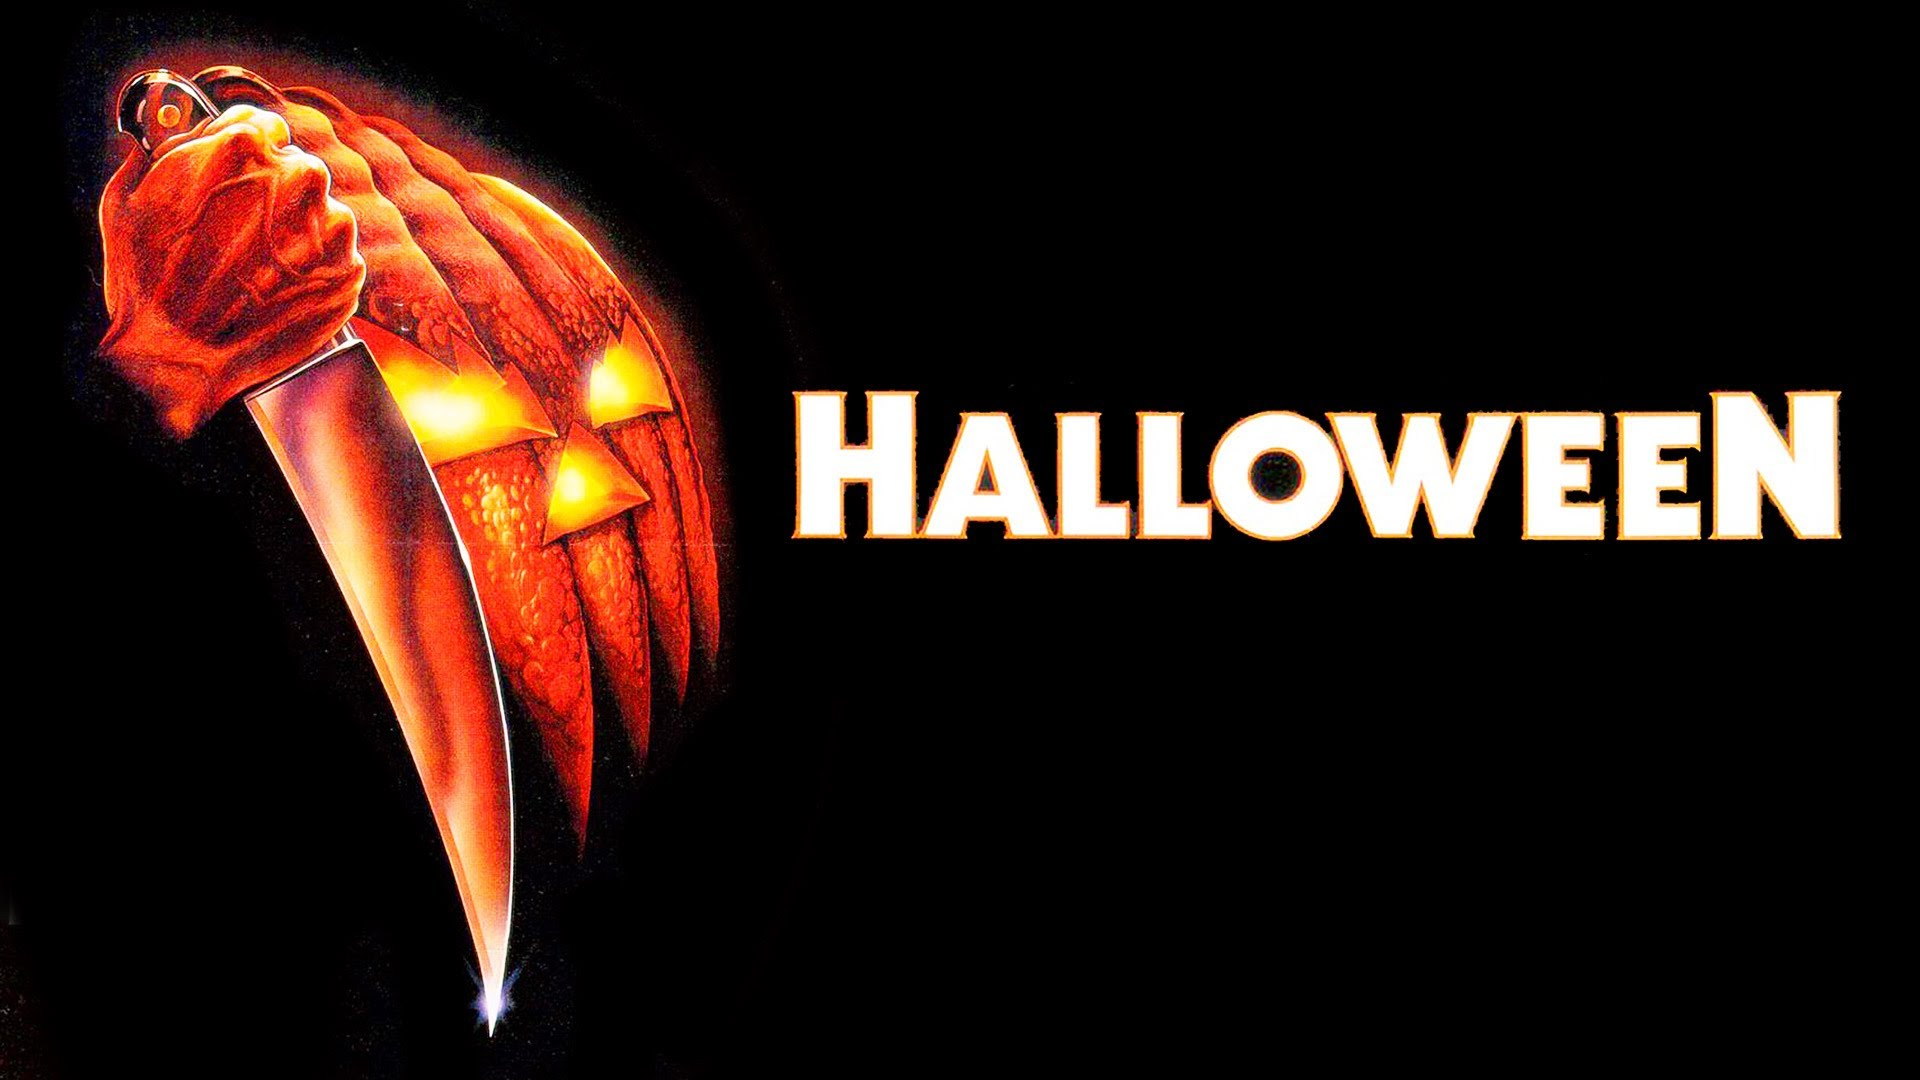 halloween (1978) facts, halloween jamie lee curtis, halloween john carpenter, halloween film